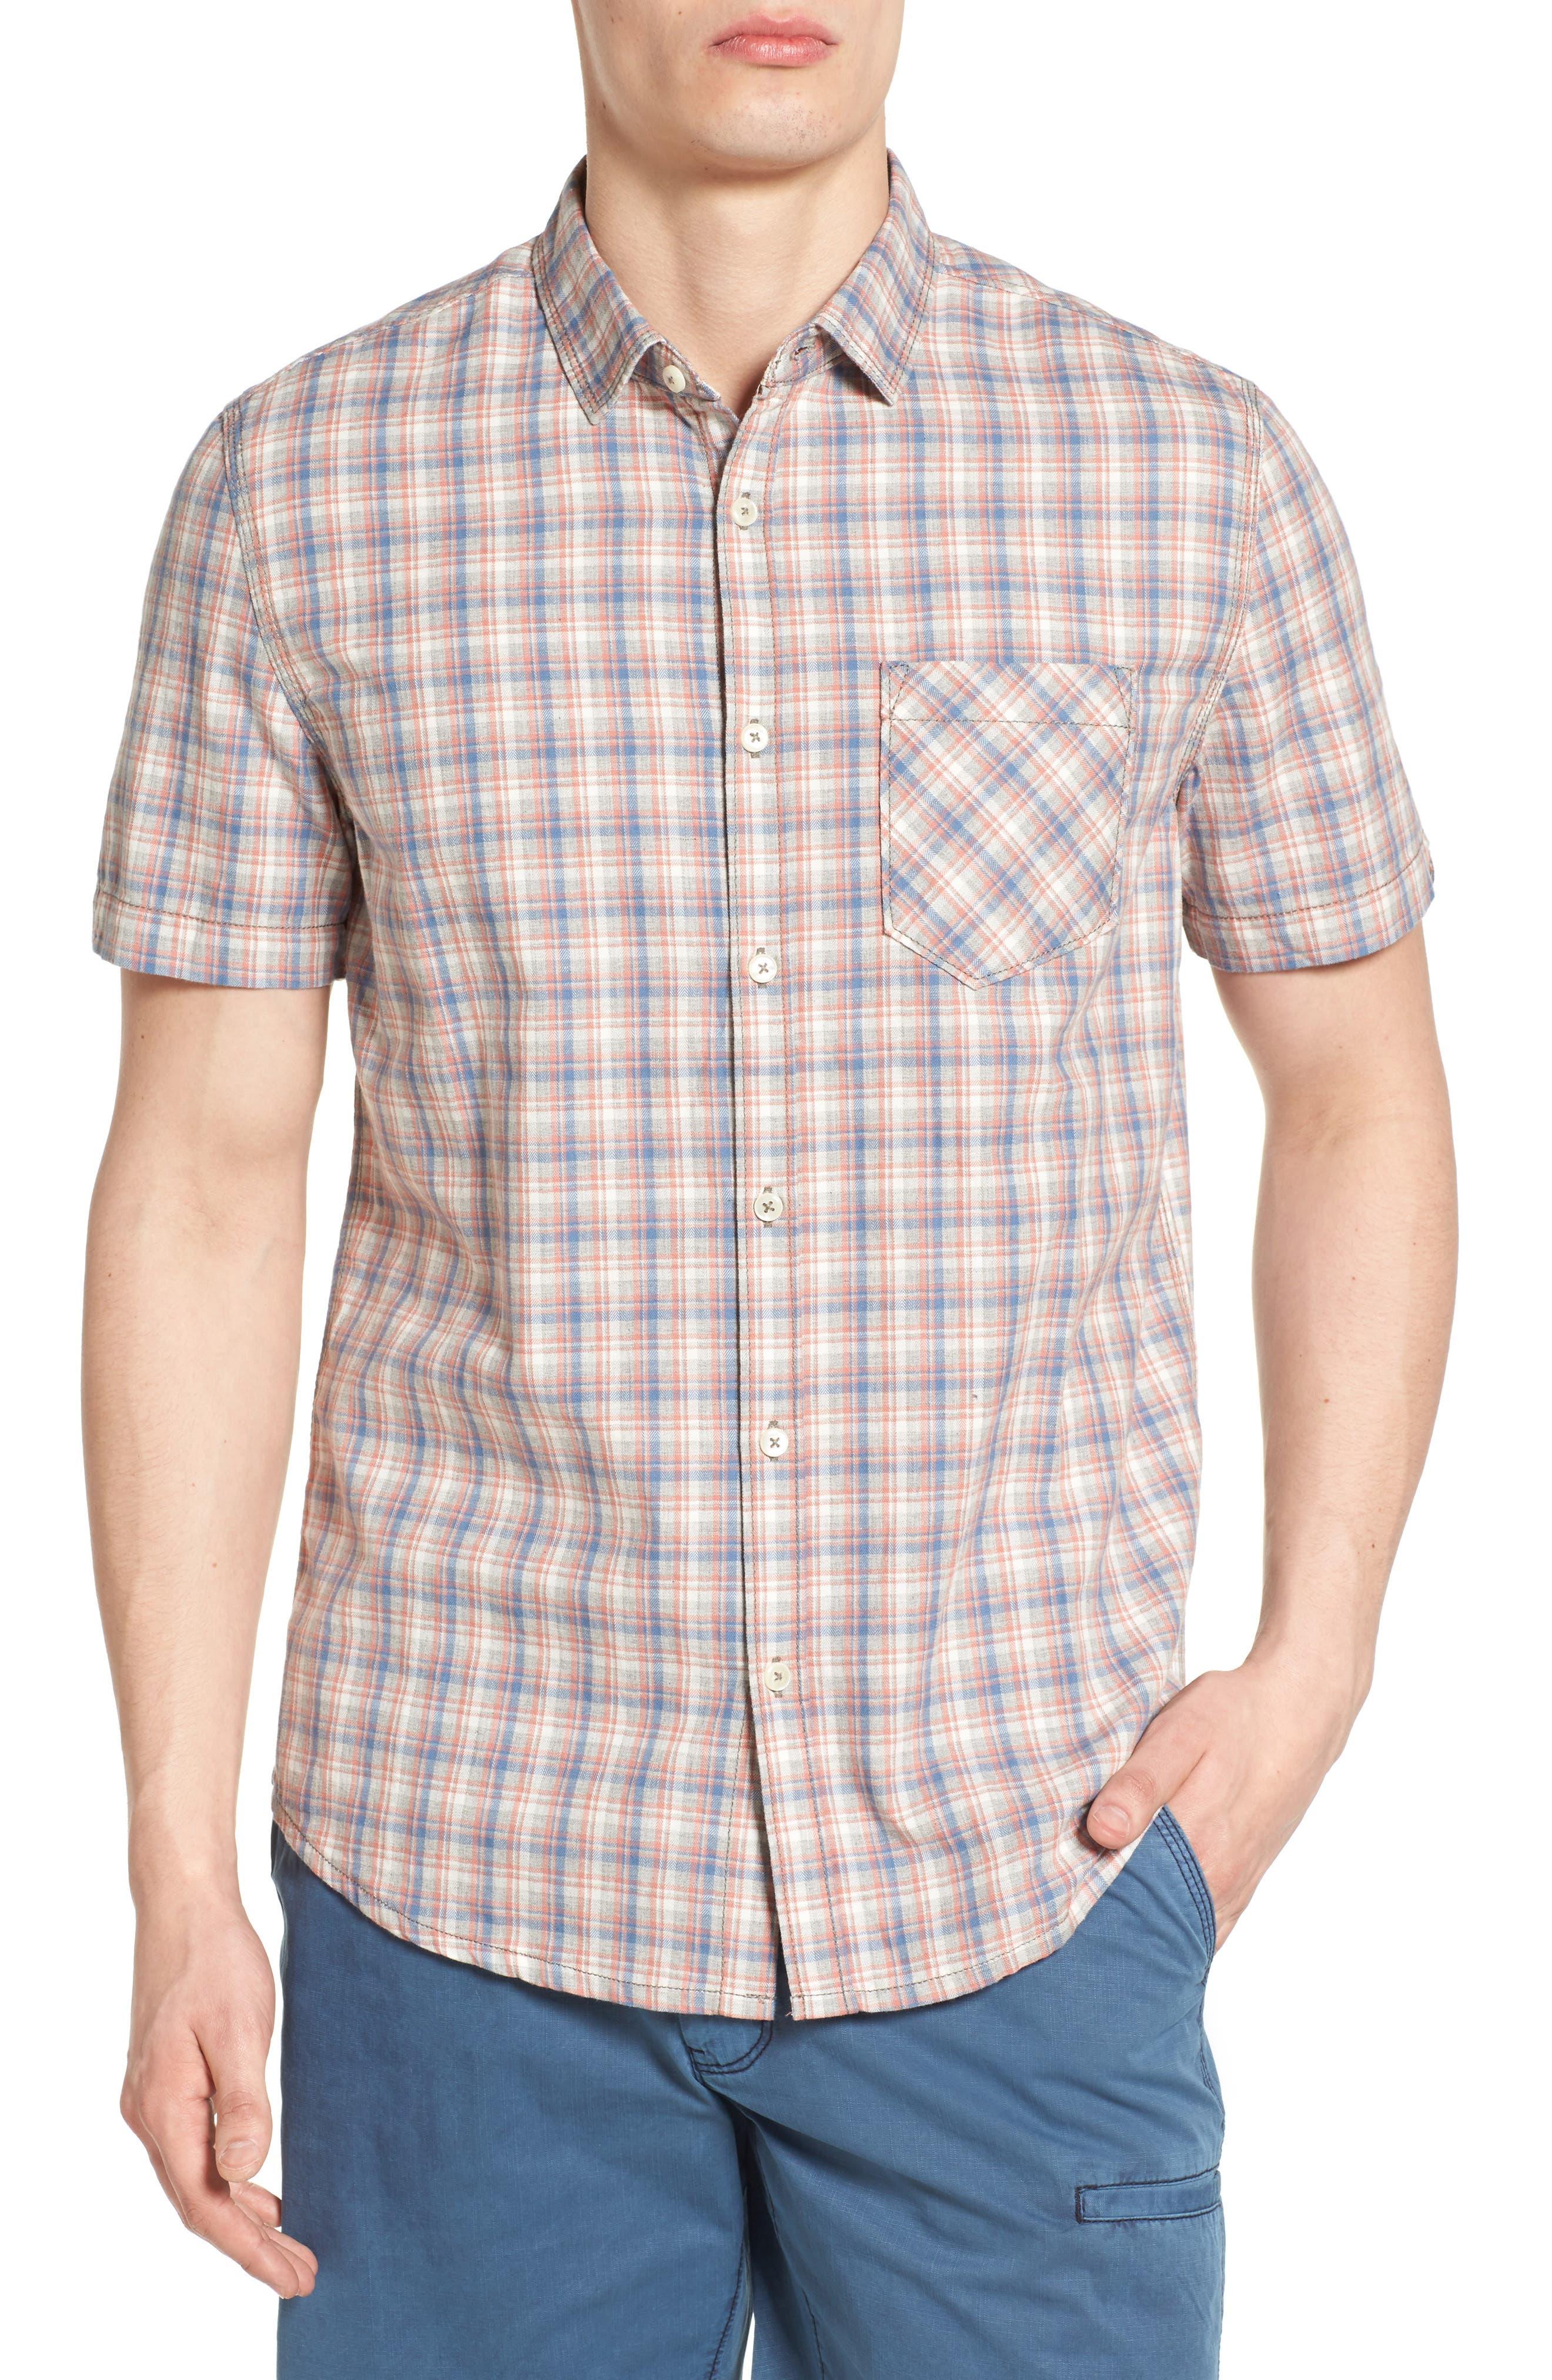 Main Image - Jeremiah Solana Regular Fit Herringbone Plaid Sport Shirt